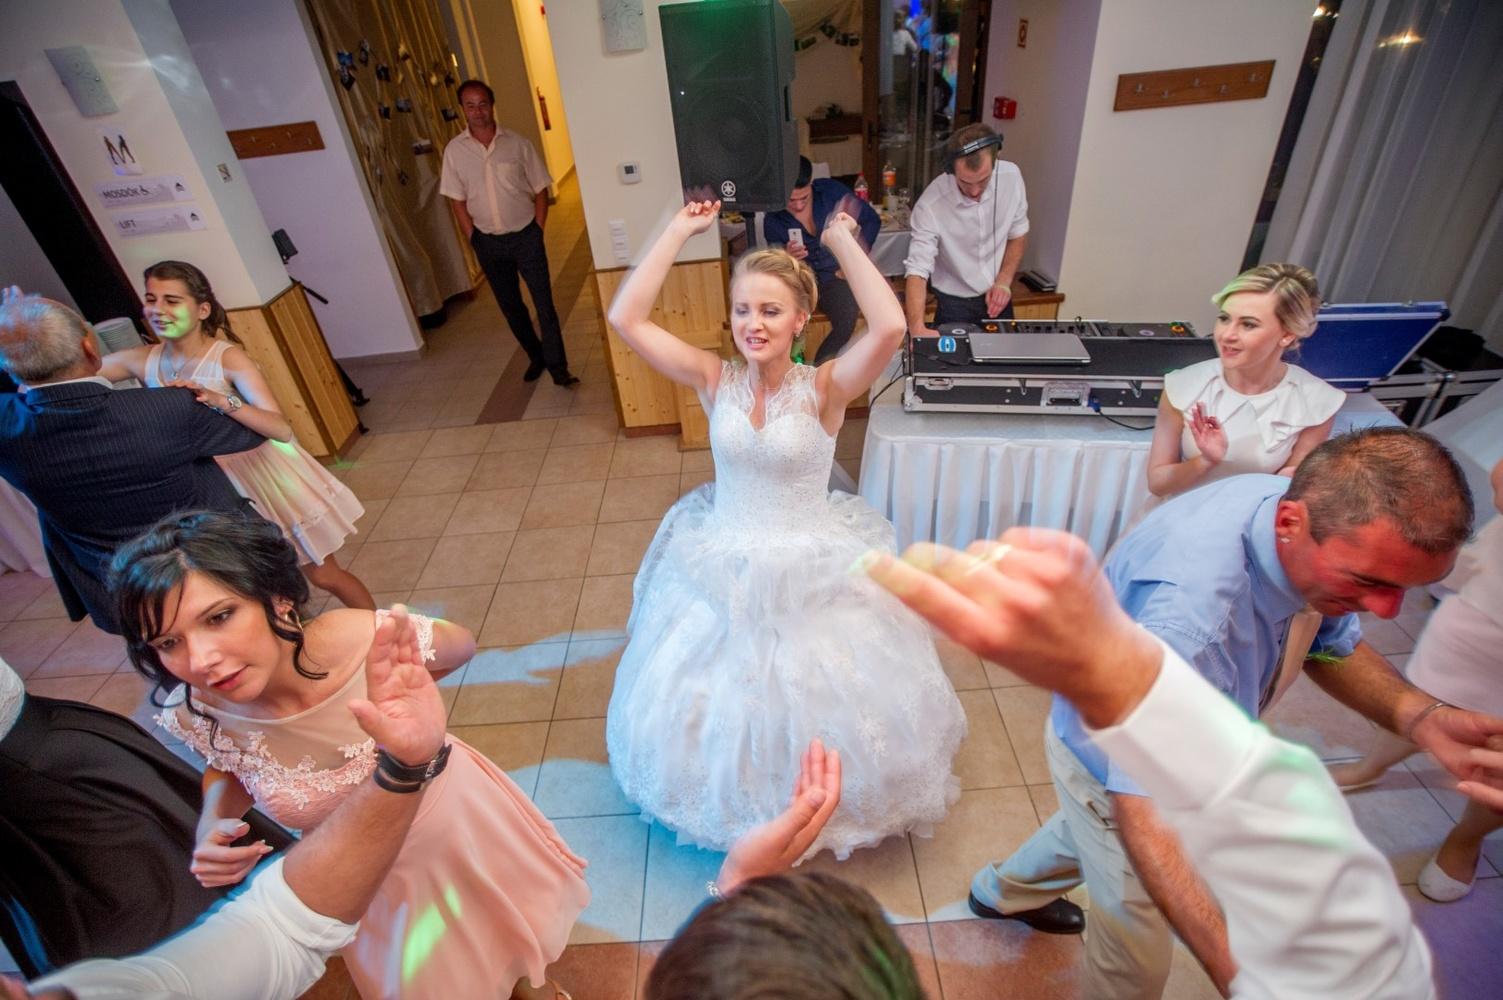 http://www.fotoz.sk/images/gallery-18/normal/eskuvo-fotozas_svadobne-fotenie_586.jpg